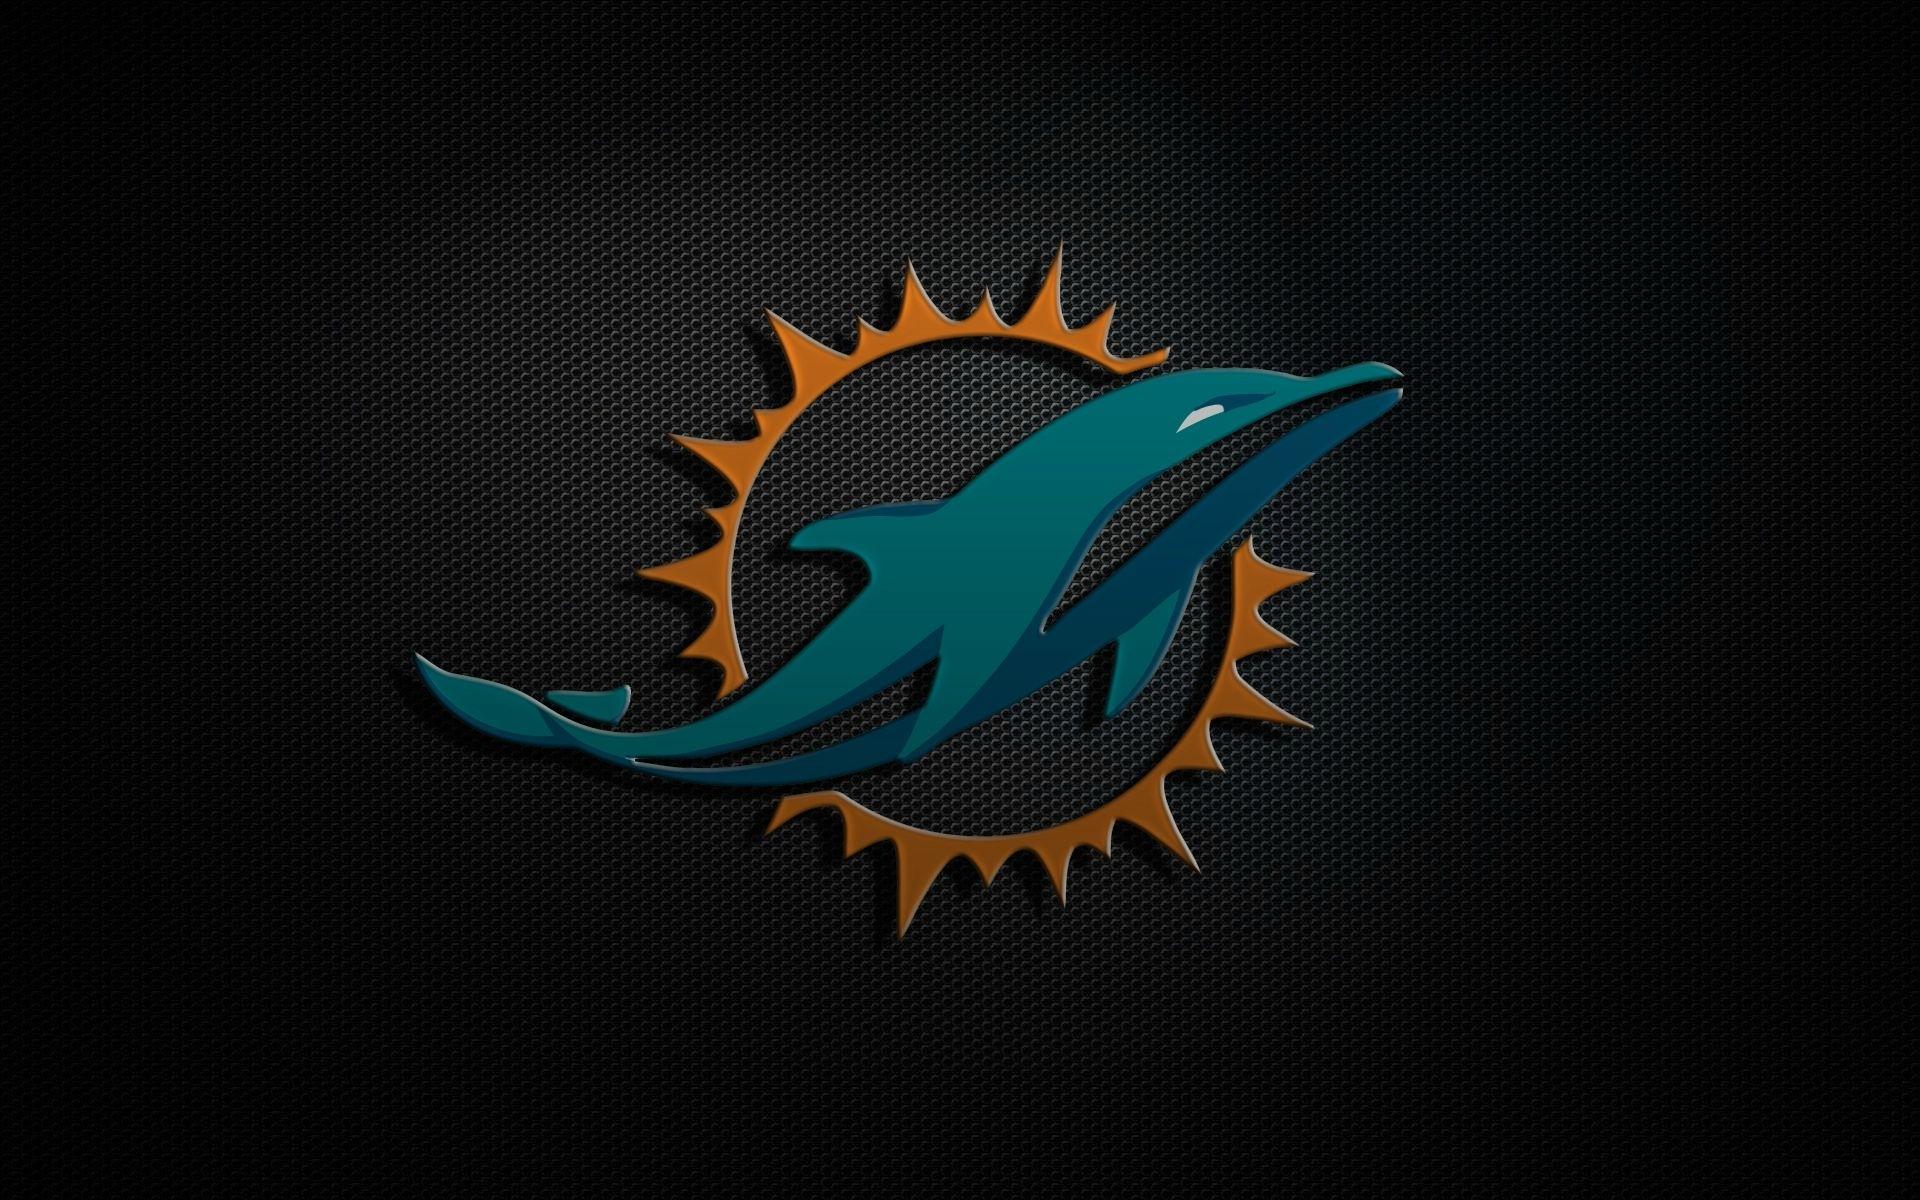 miami-dolphins-logo-wallpaper - wallpaper.wiki